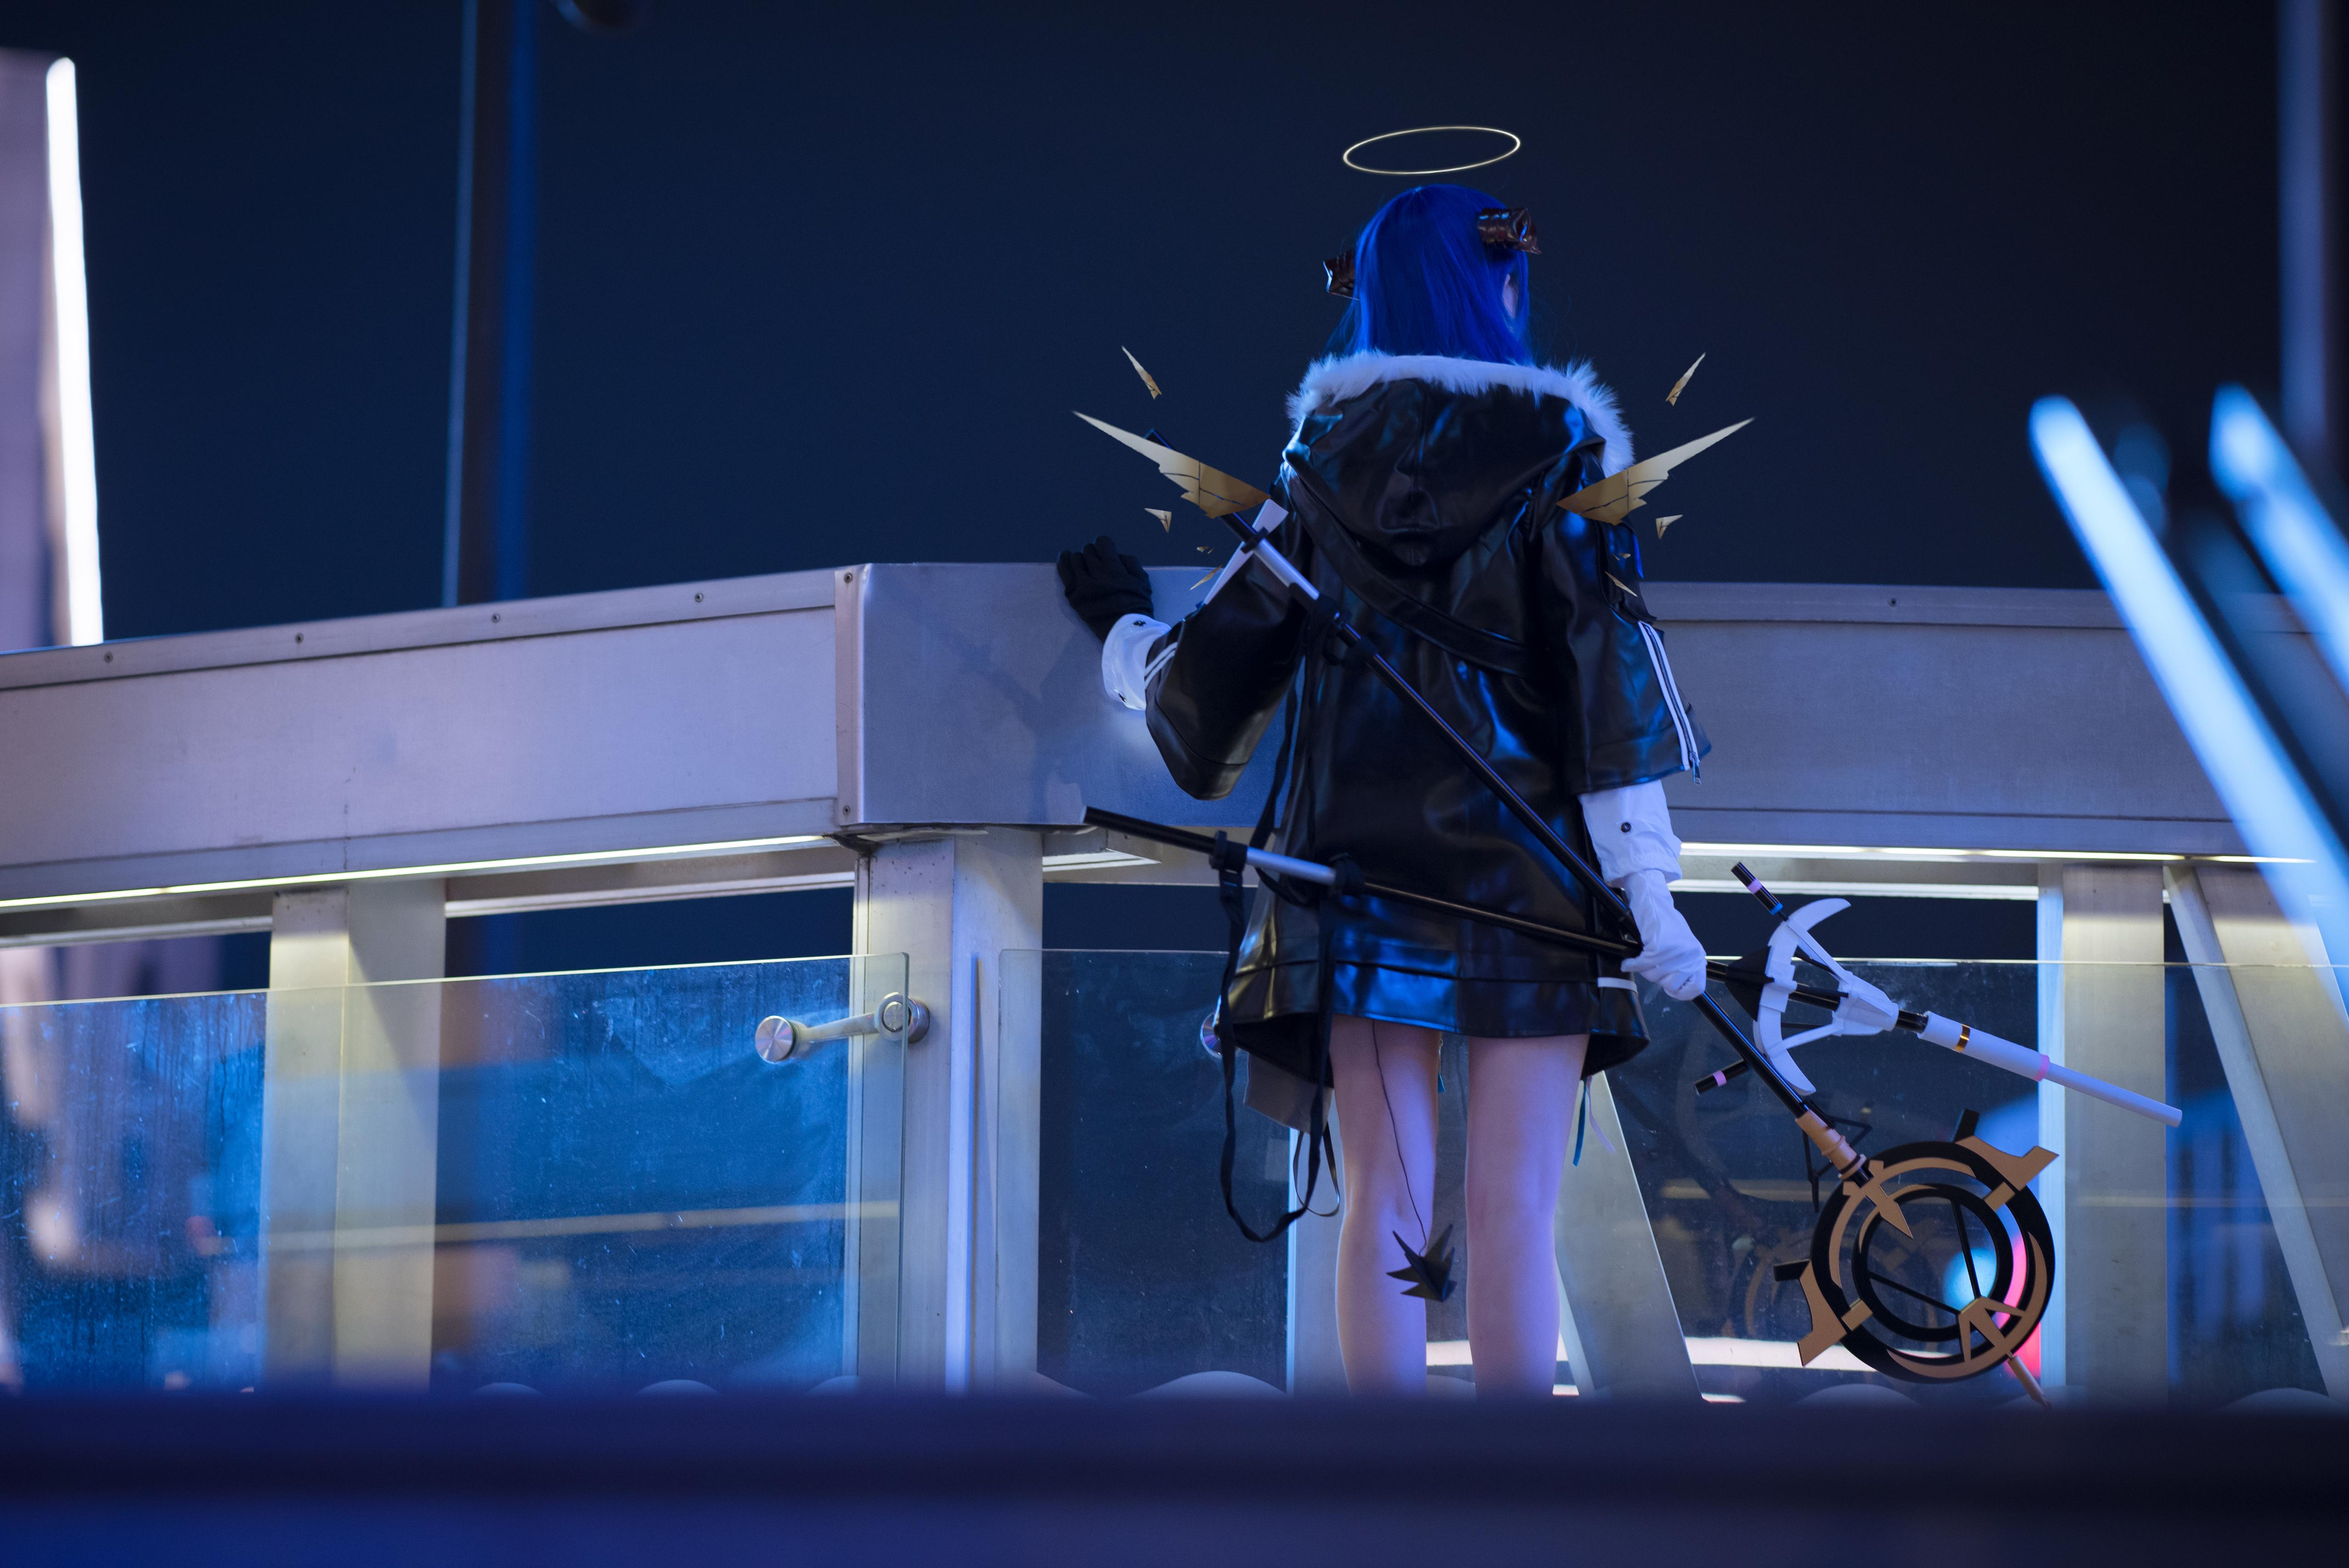 《明日方舟》法则cosplay【CN:KizunaFerin】-第16张